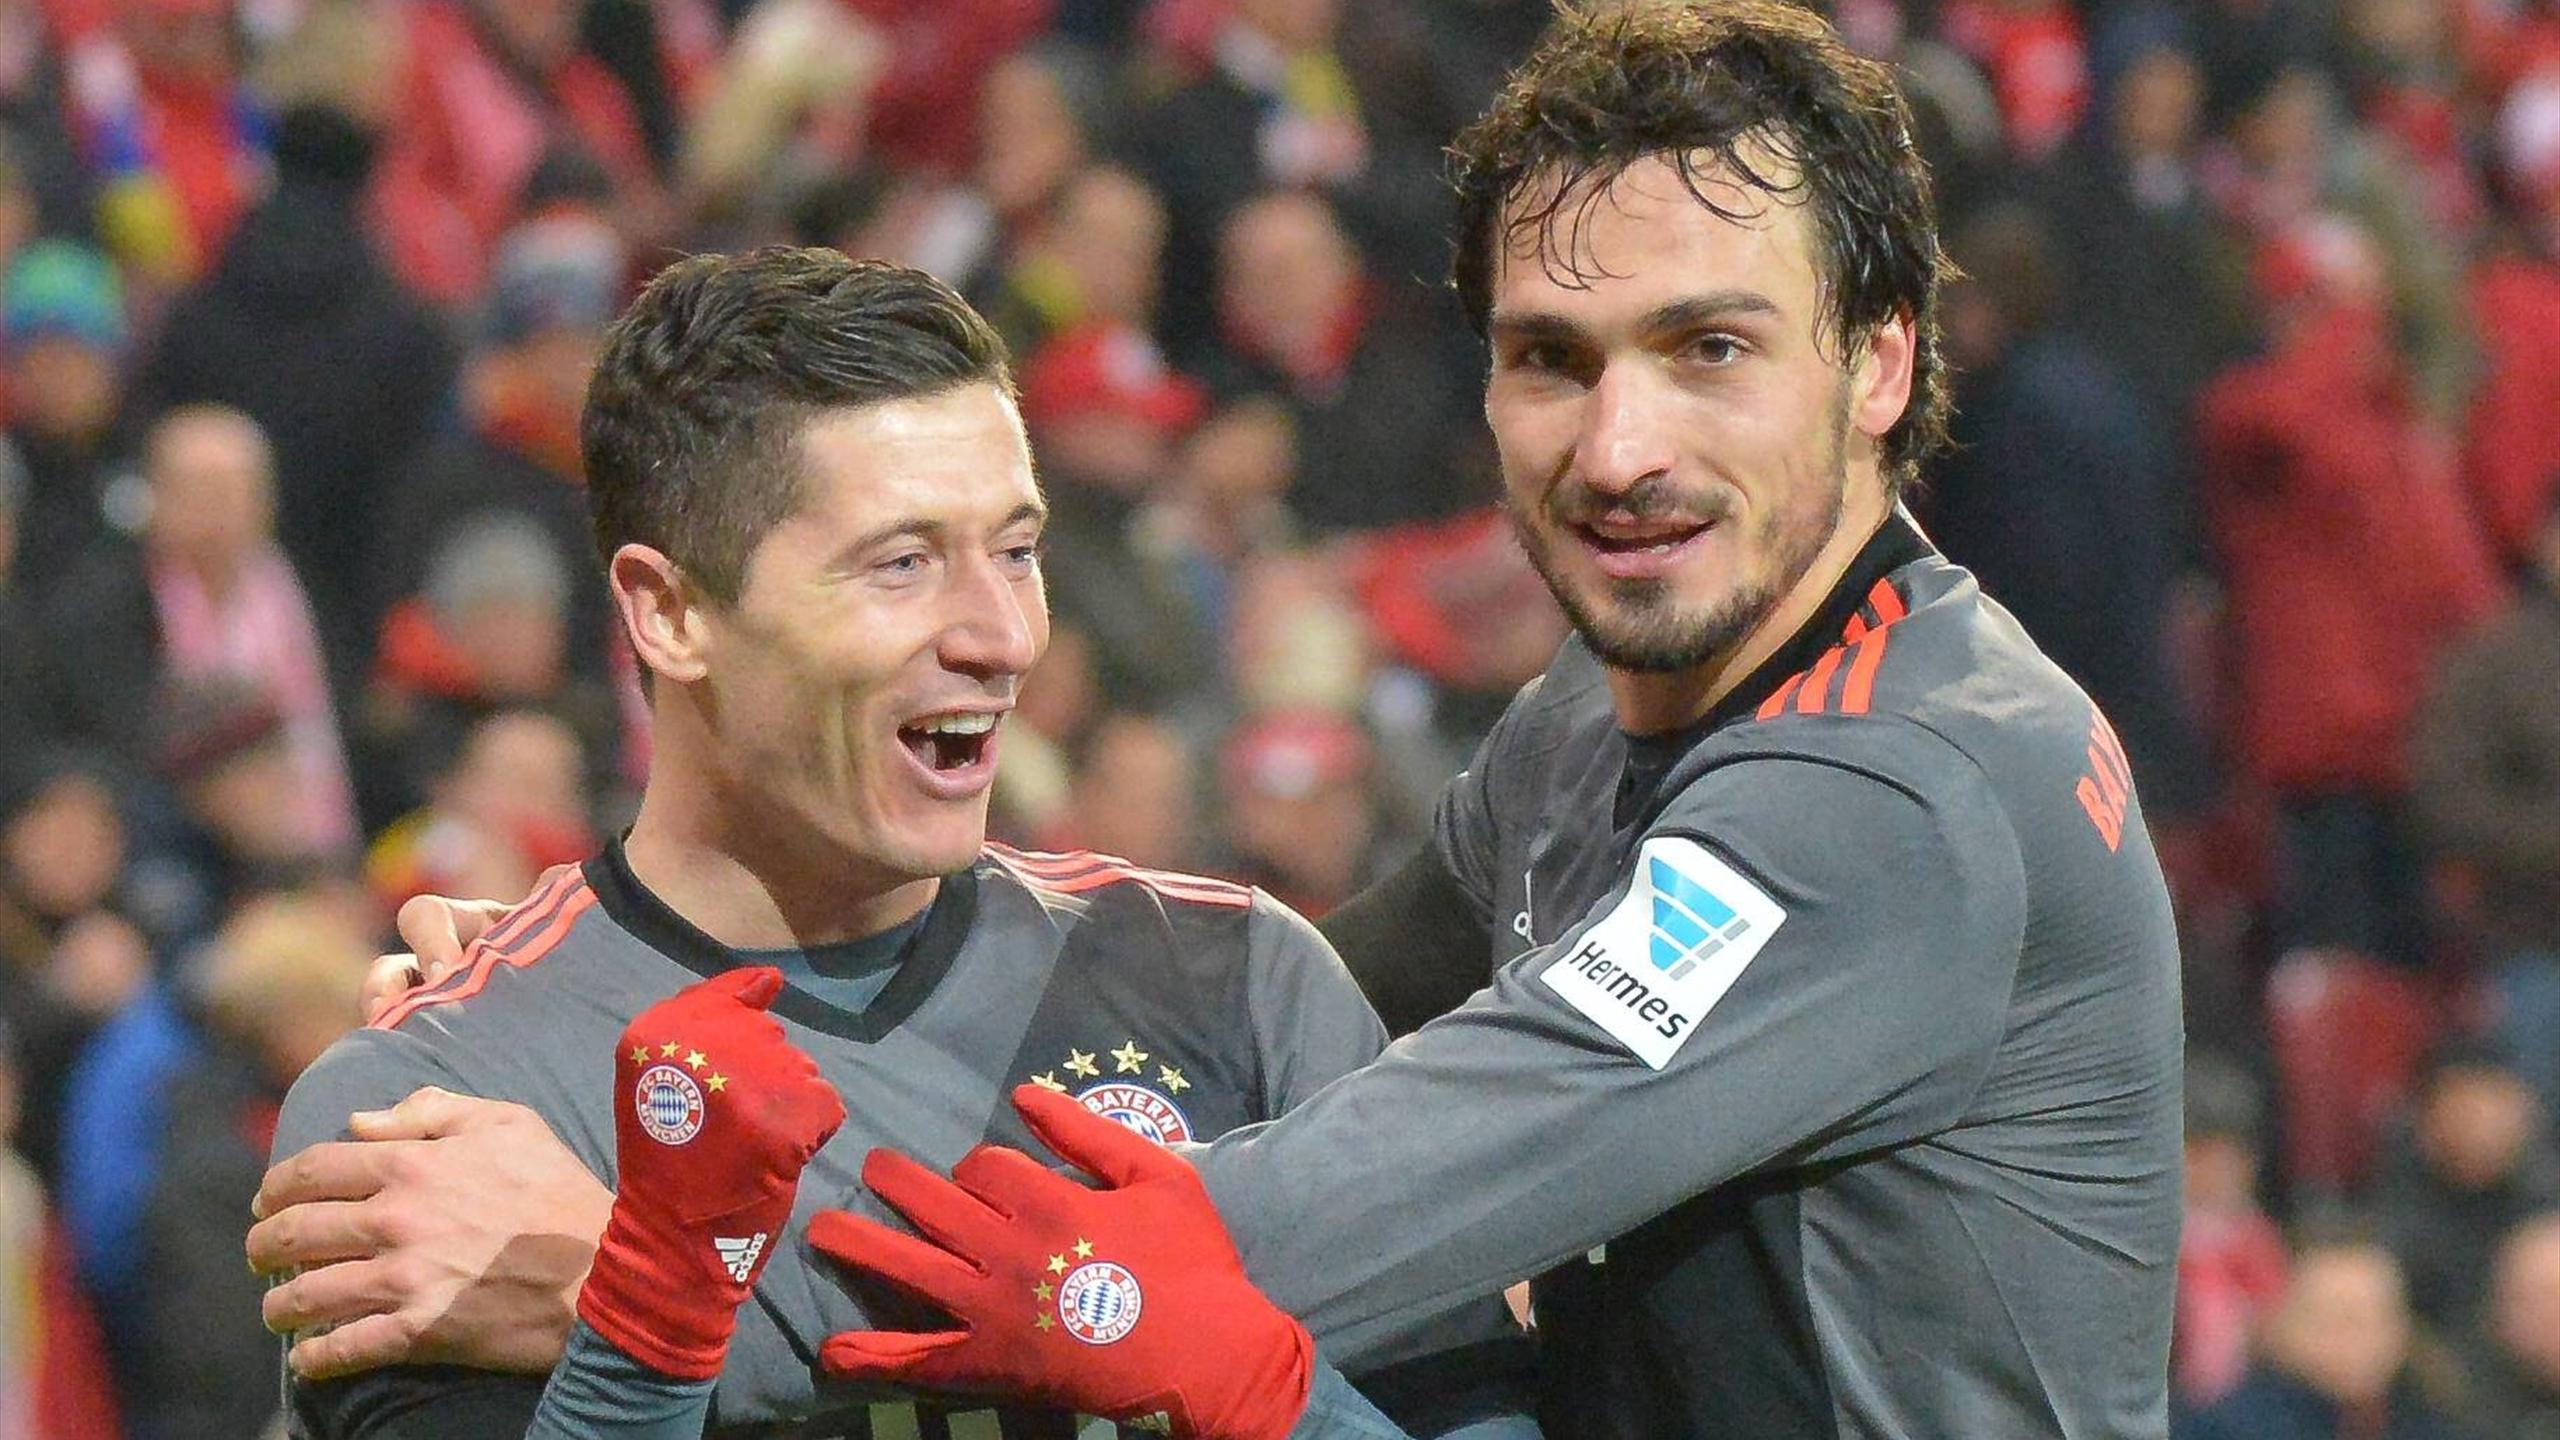 Lewandowski Hummels - Mainz-Bayern München - Bundesliga 2016/2017 - Imago